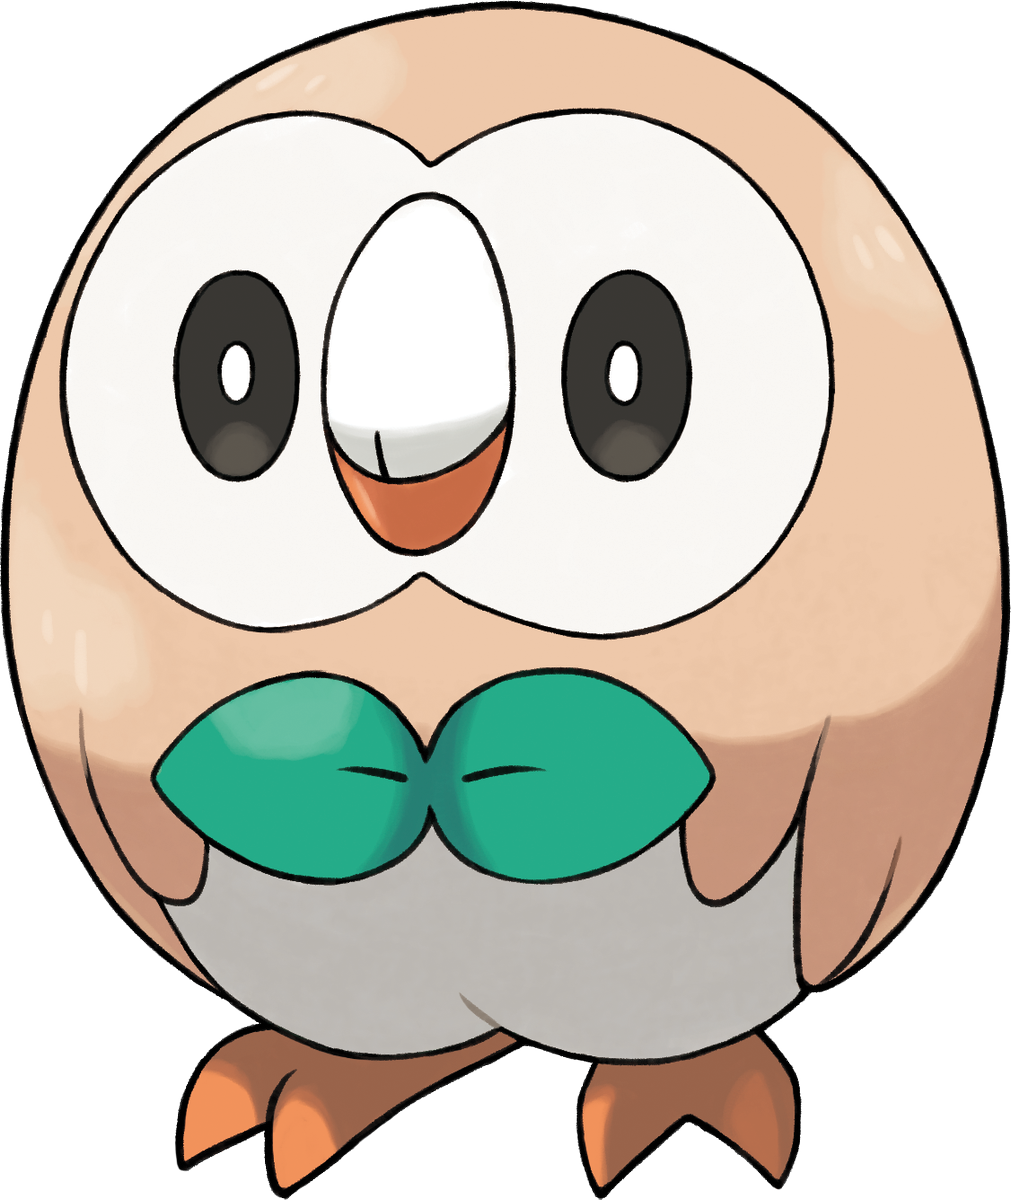 Videojuego >> Pokémon Sol y Pokémon Luna (23 de Noviembre) CiGCEE7WwAA-d7A